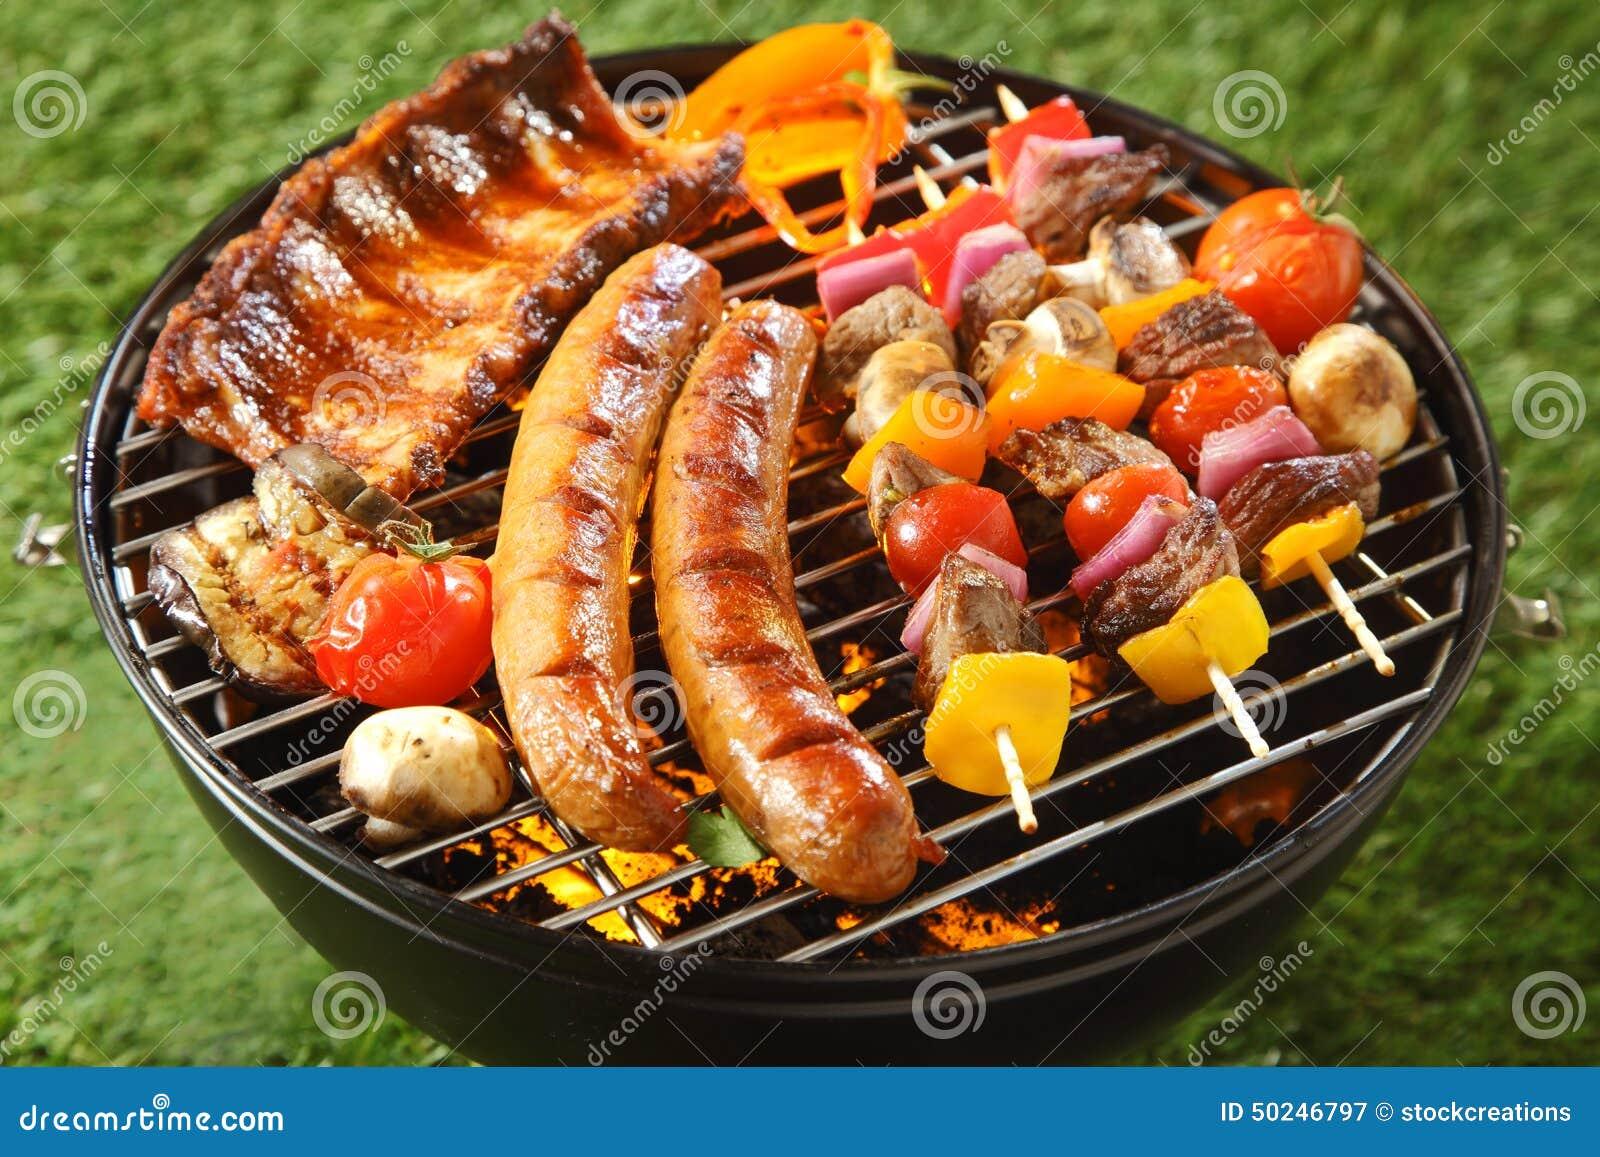 Assorted a grill la viande sur un barbecue d 39 t photo for Quelle viande pour un barbecue